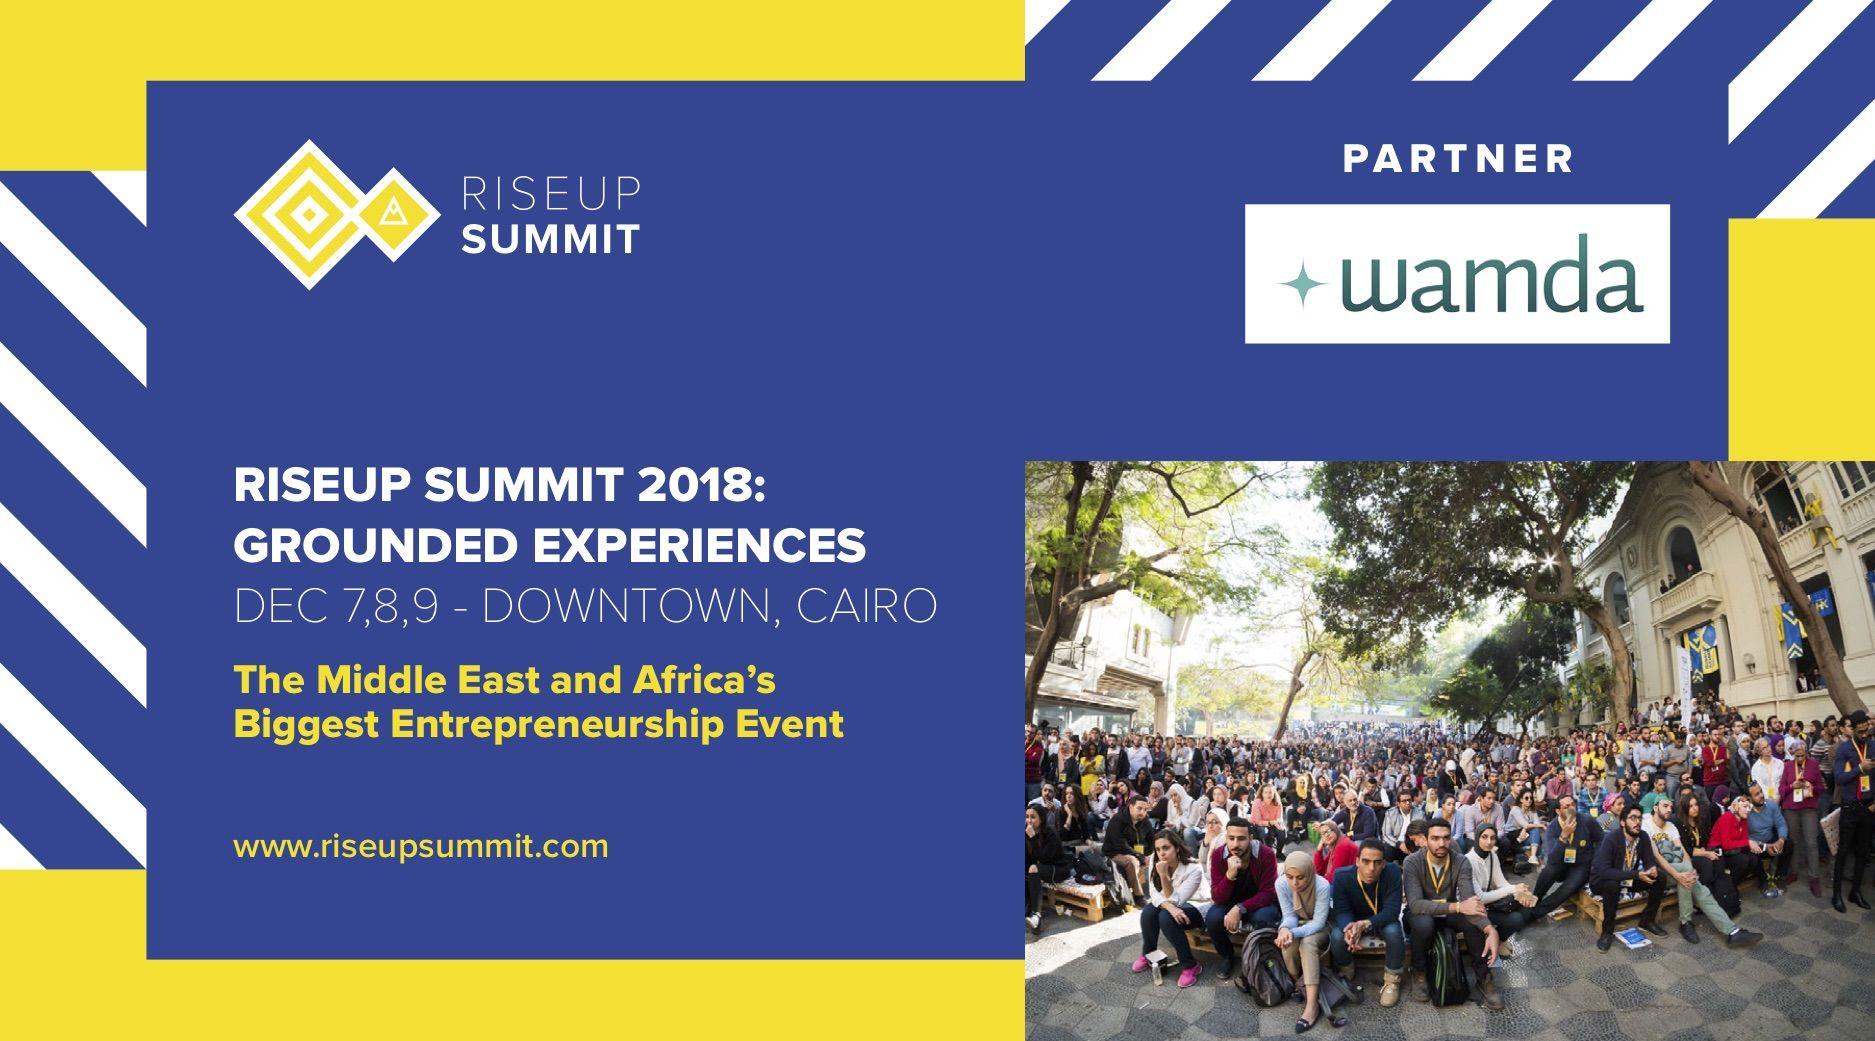 RiseUp Summit 2018